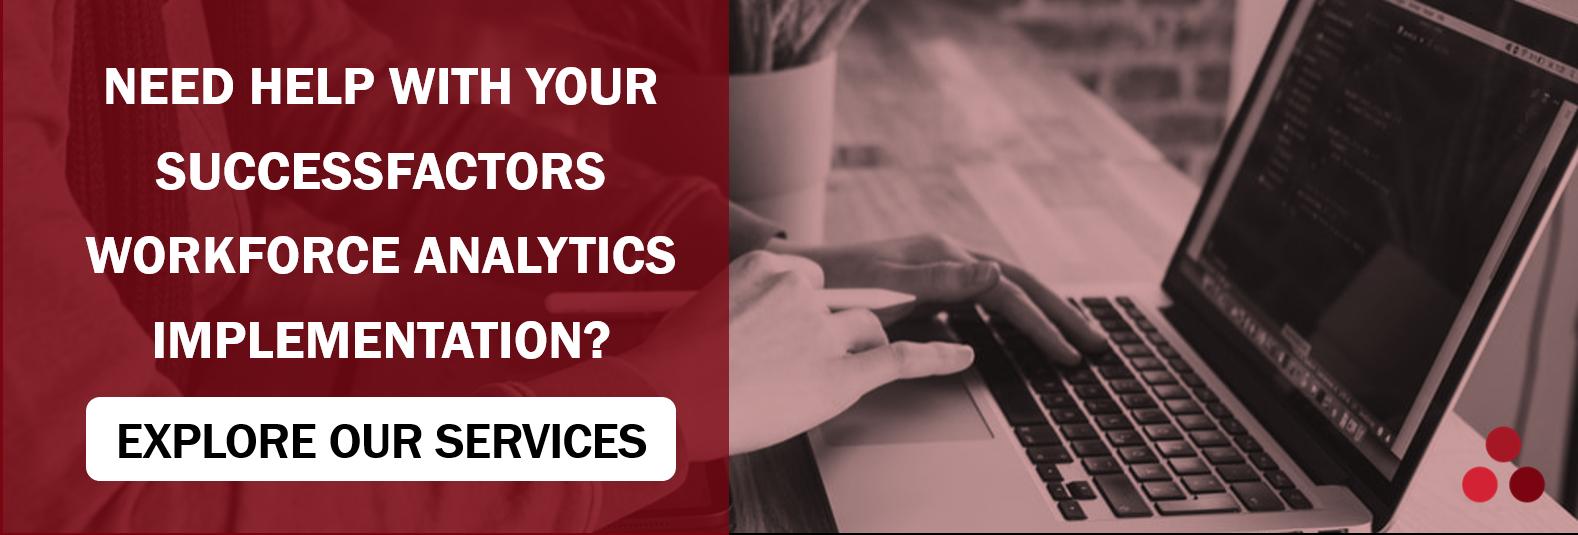 Need help with your SuccessFactors Workforce Analytics Implementation